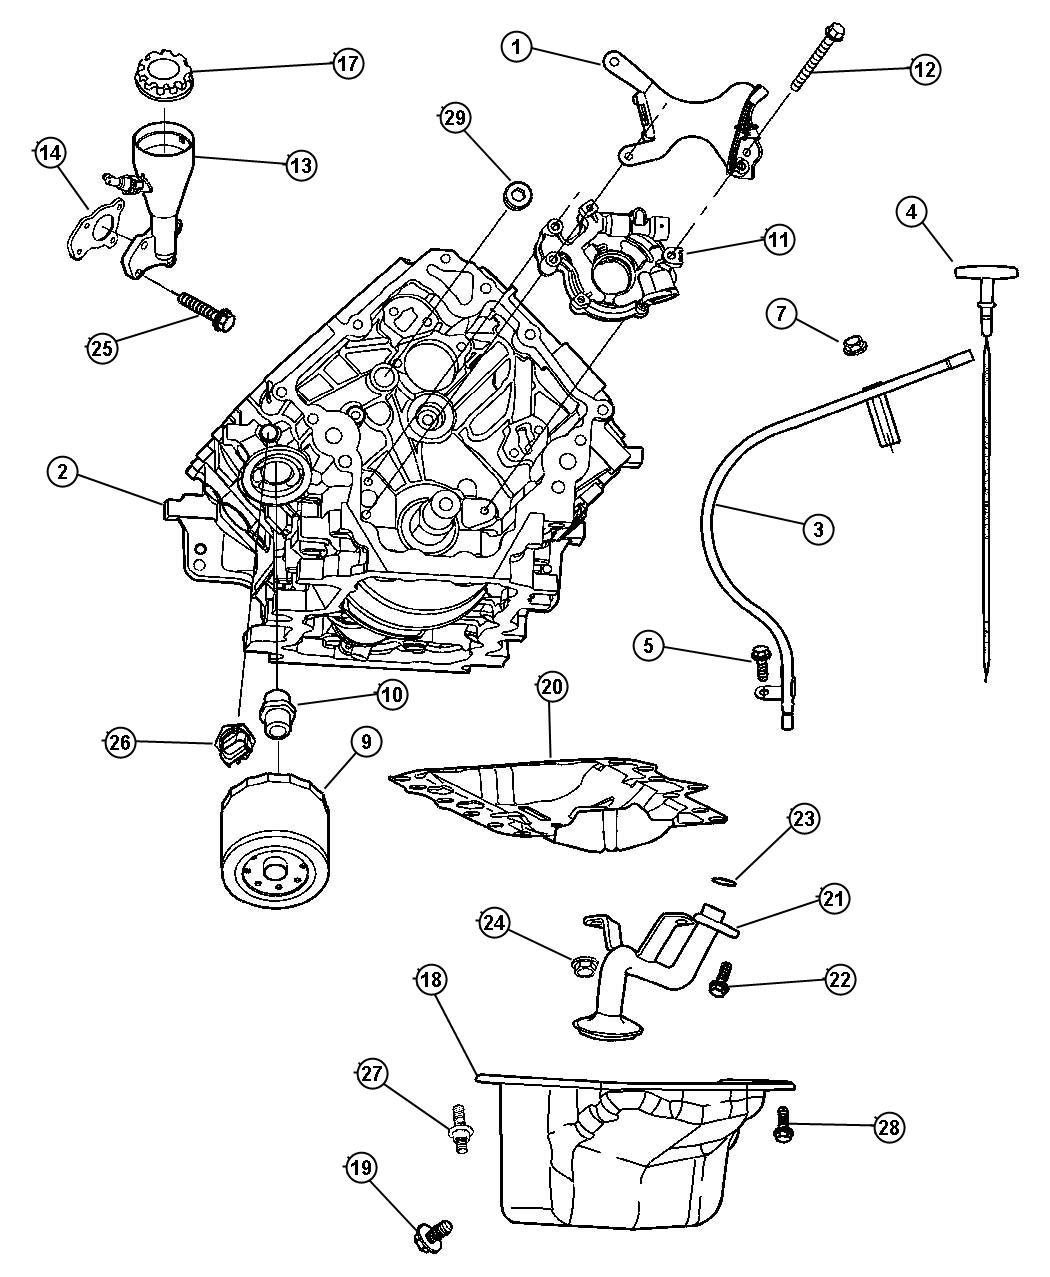 Diagram Manual Dodge Durango Engine Timing Diagram